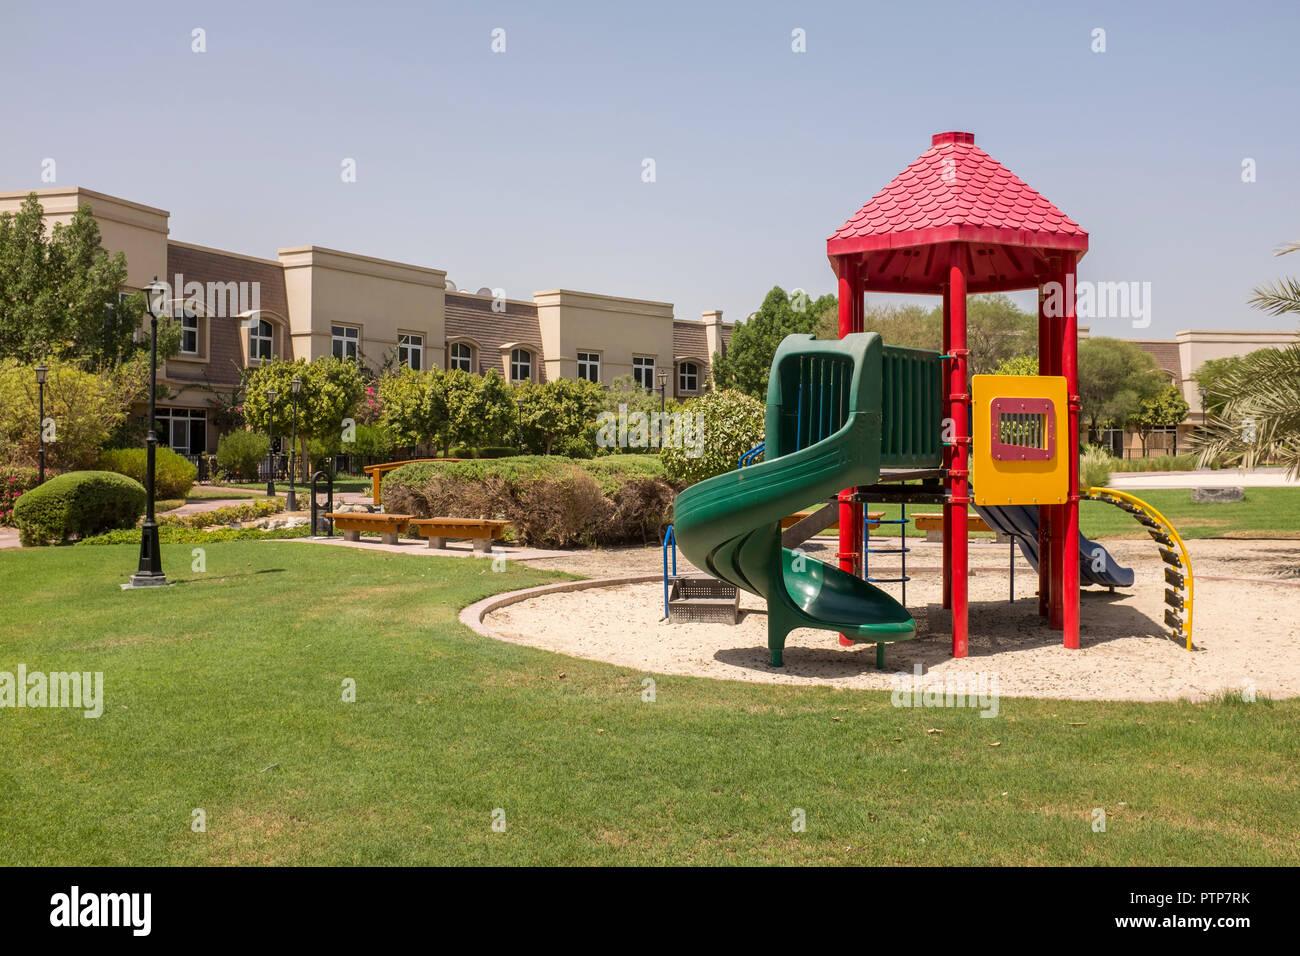 Public park in the Mirdiff district of Dubai - Stock Image